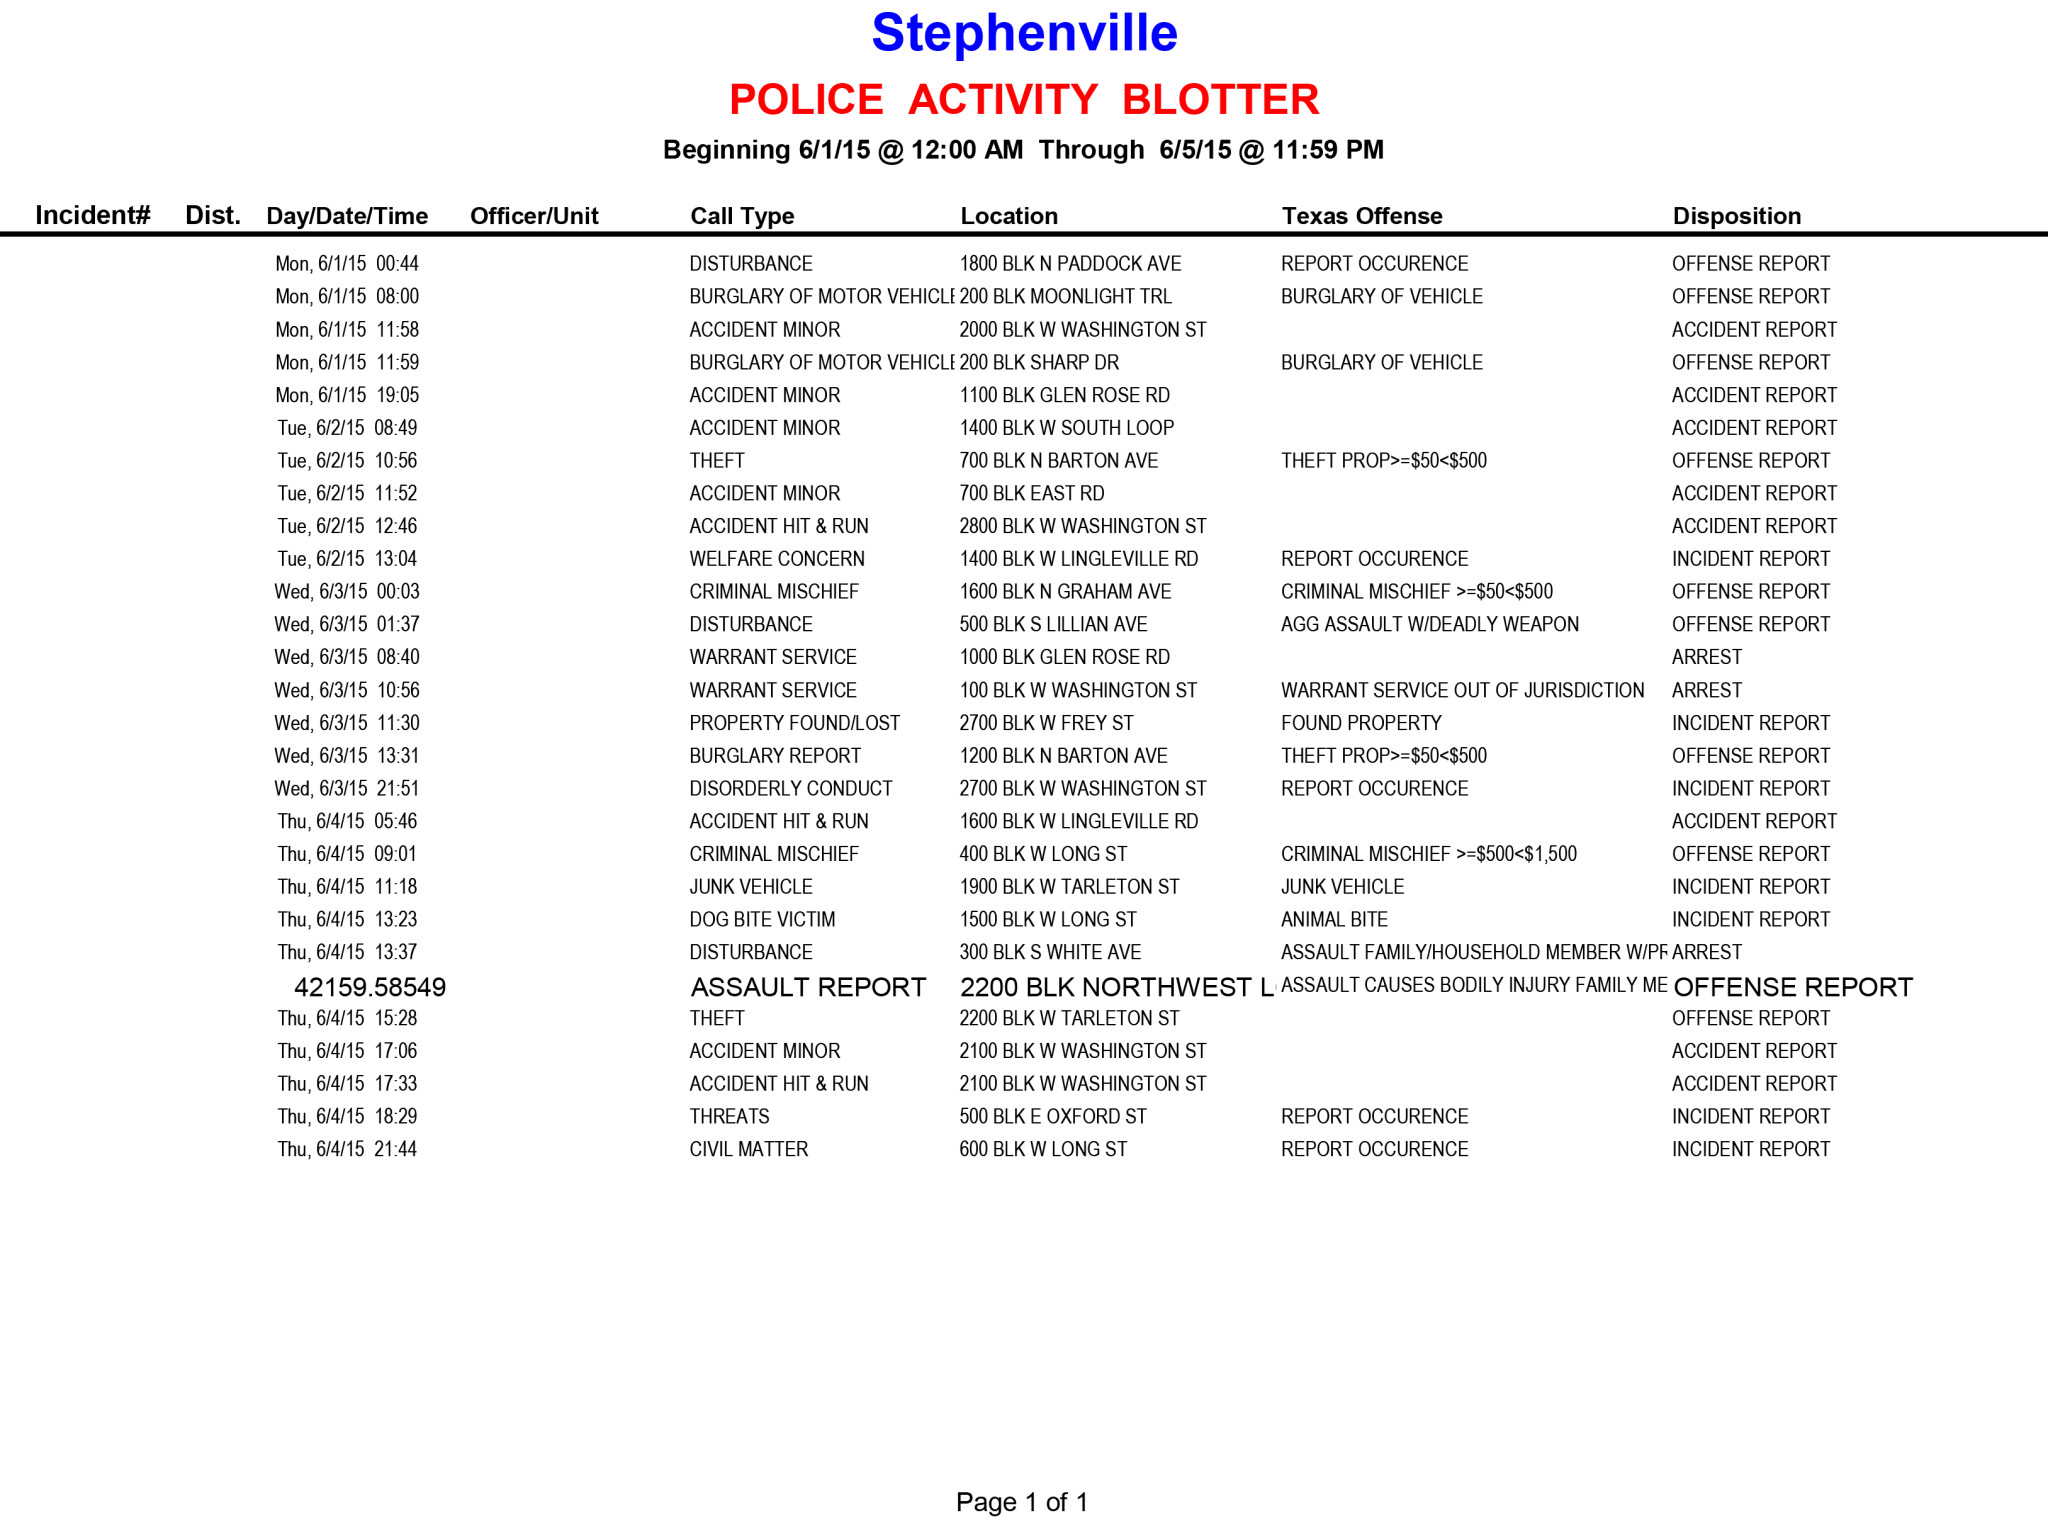 20150601-0605 Police Activity Blotter